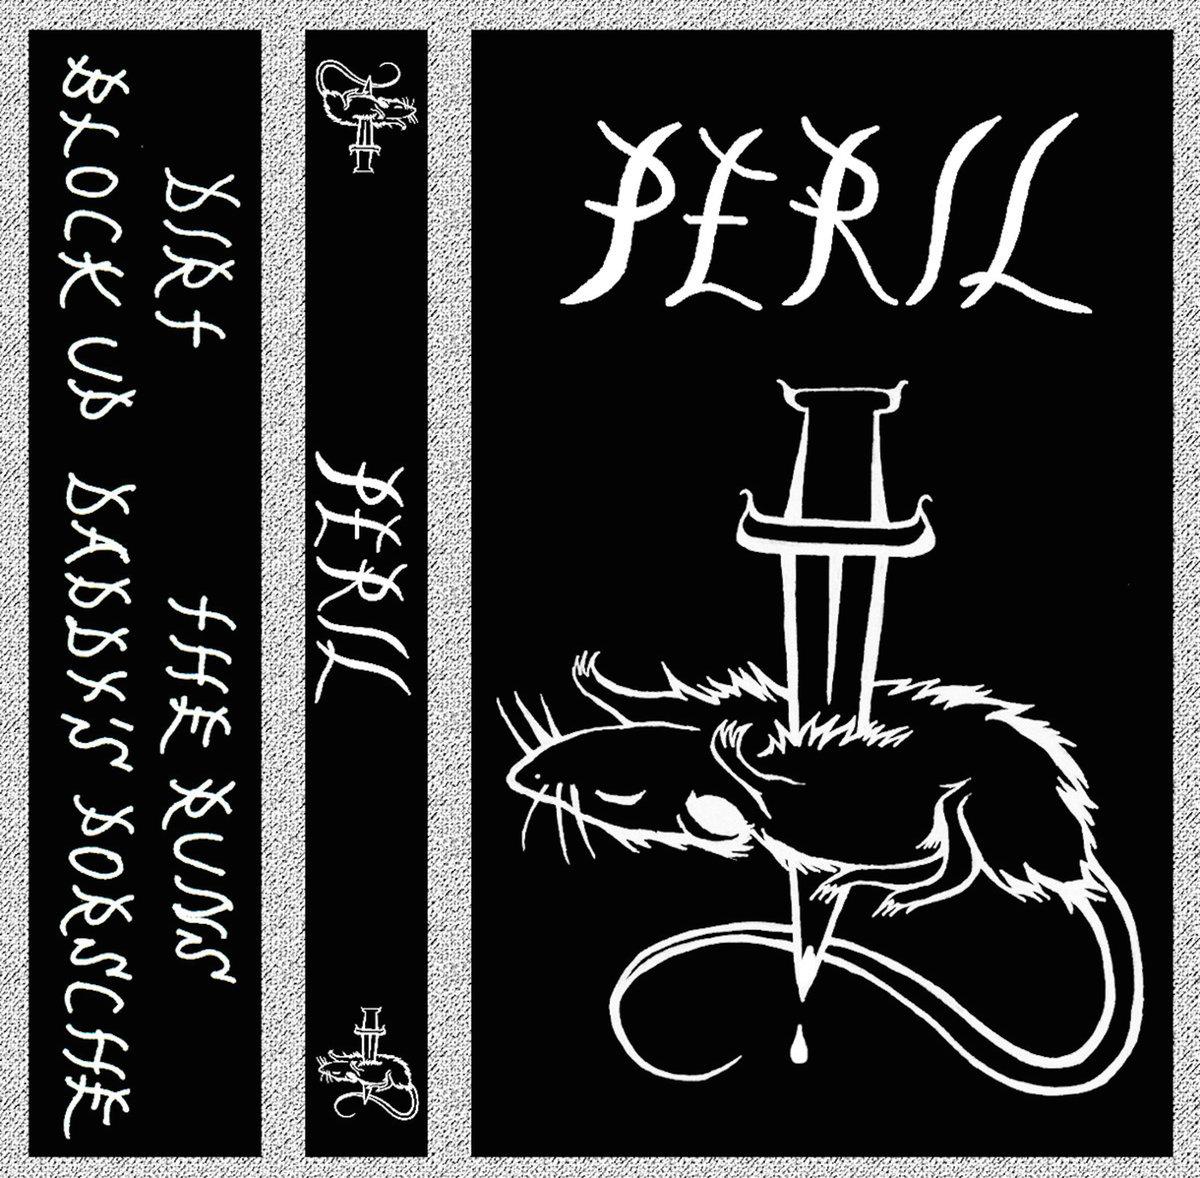 Peril - Demo Tape